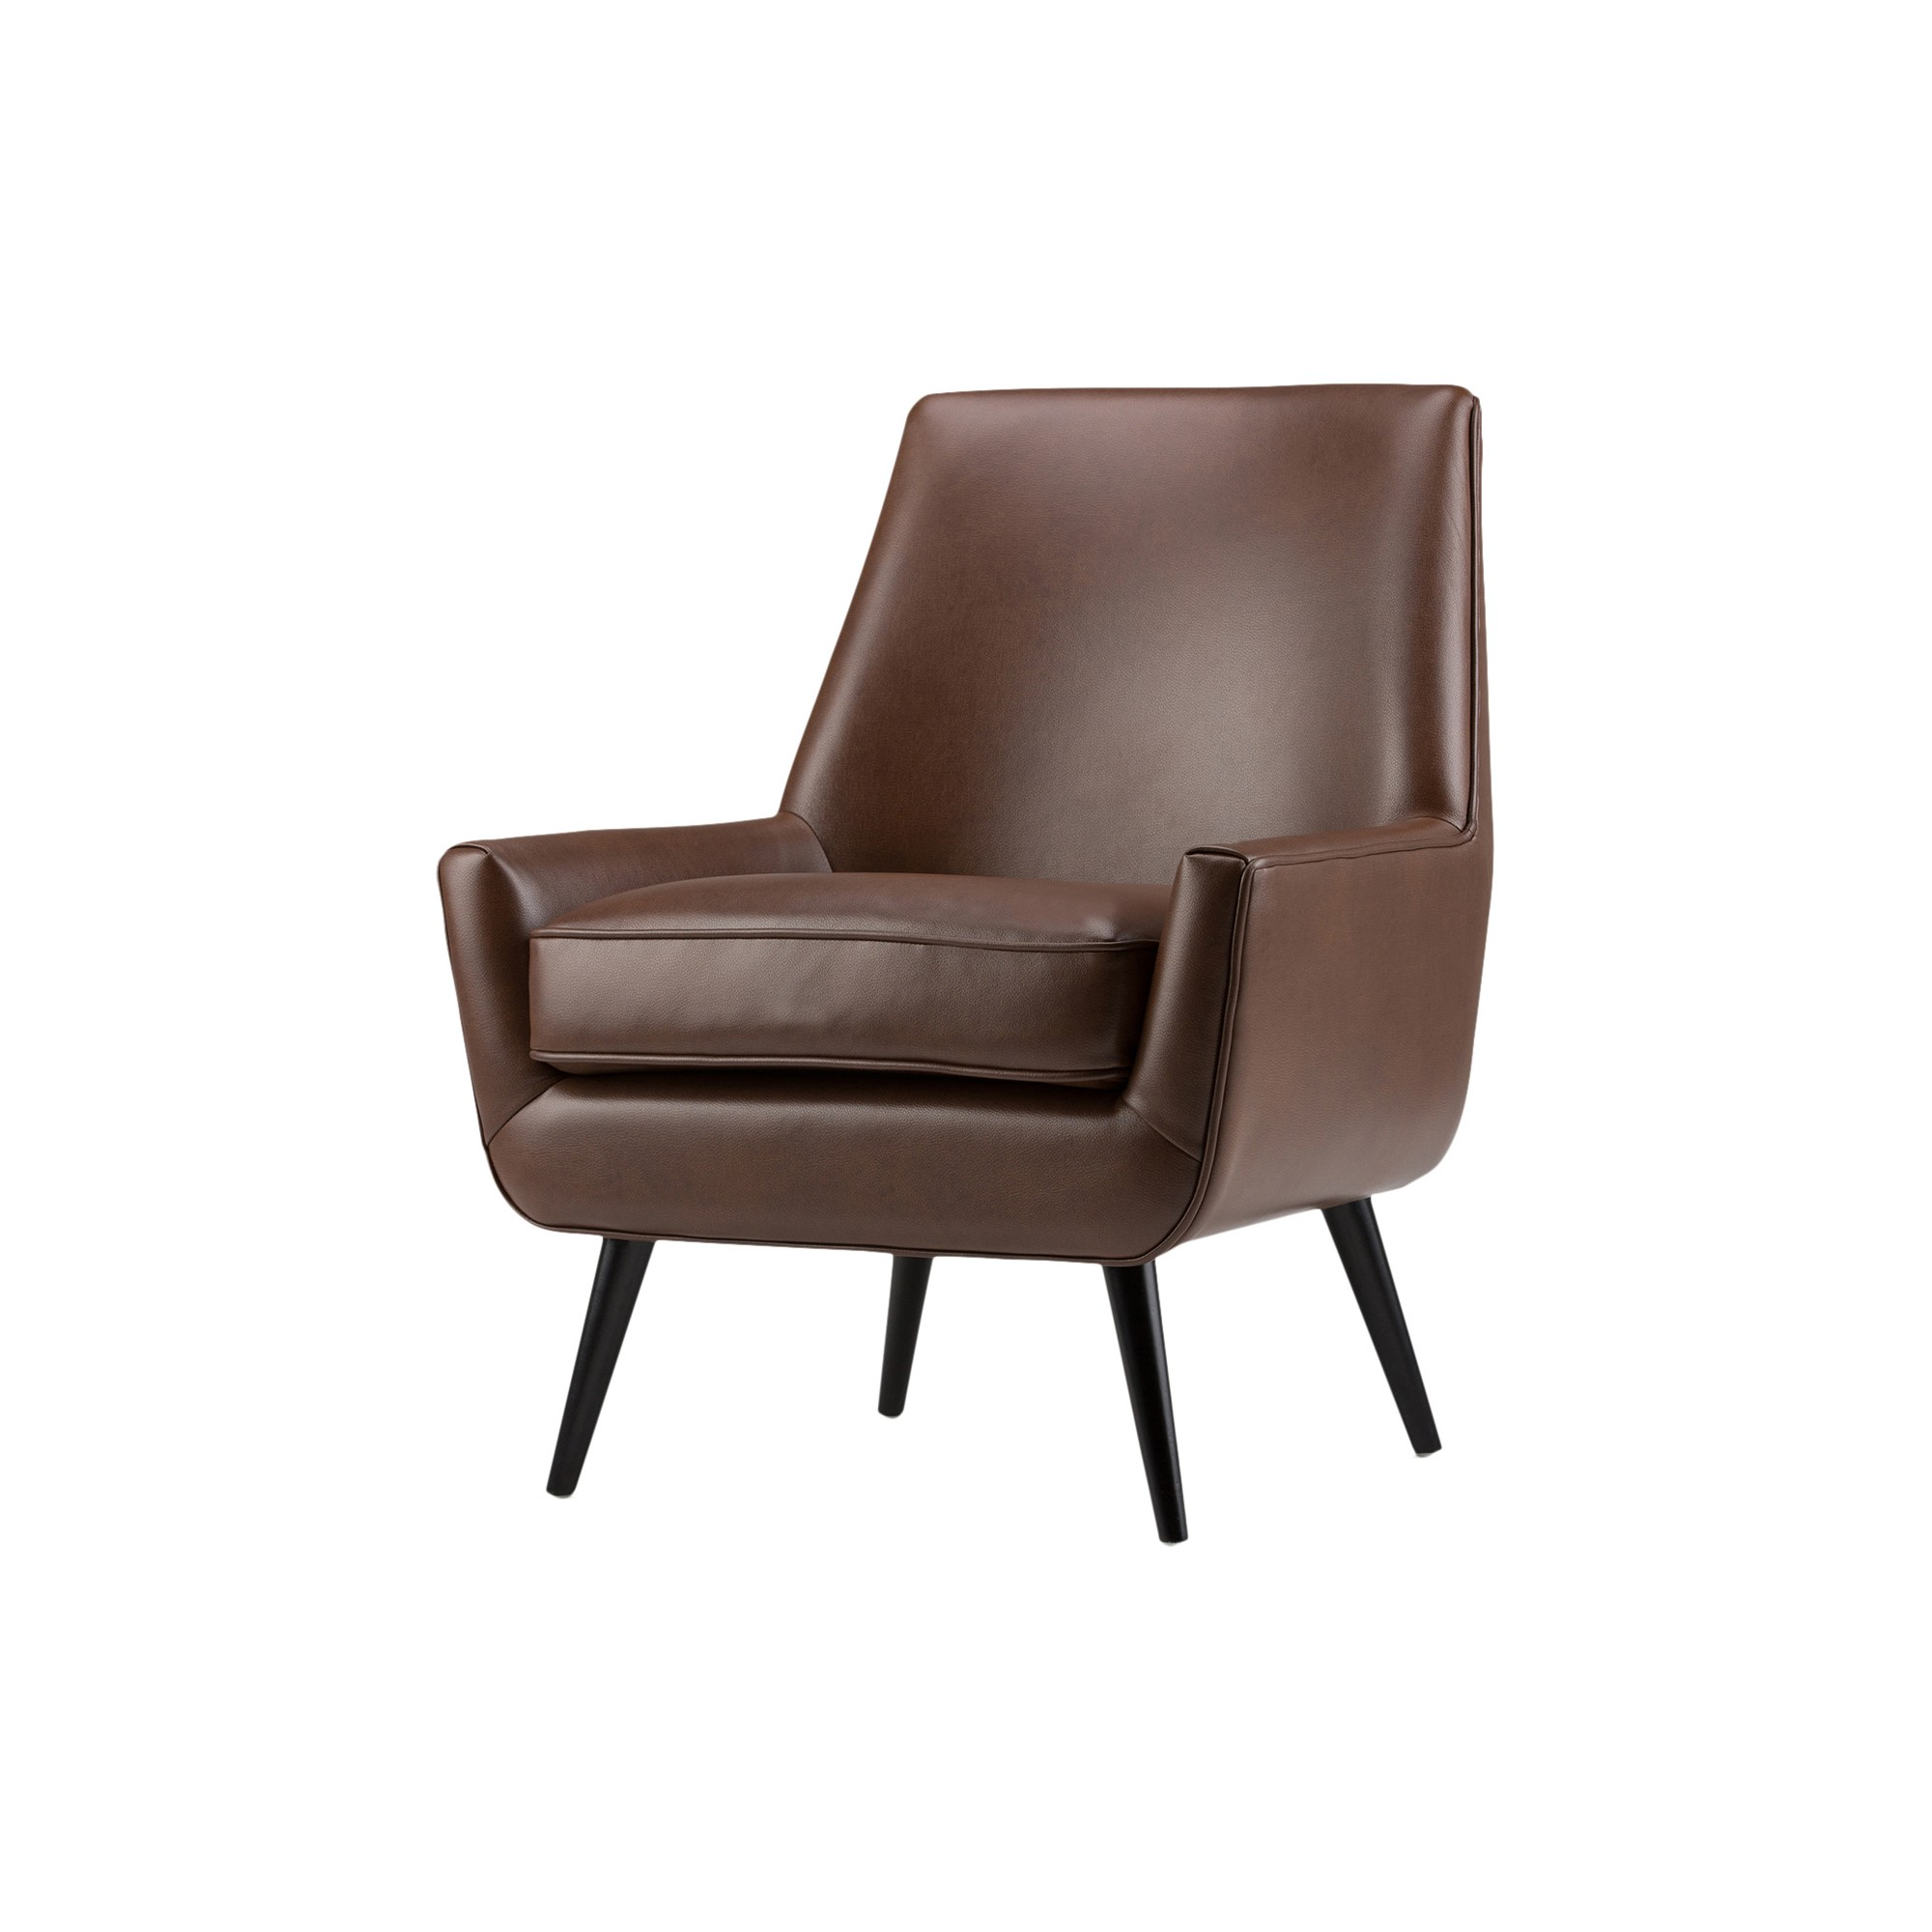 30 carson mid century accent chair saddle brown faux air